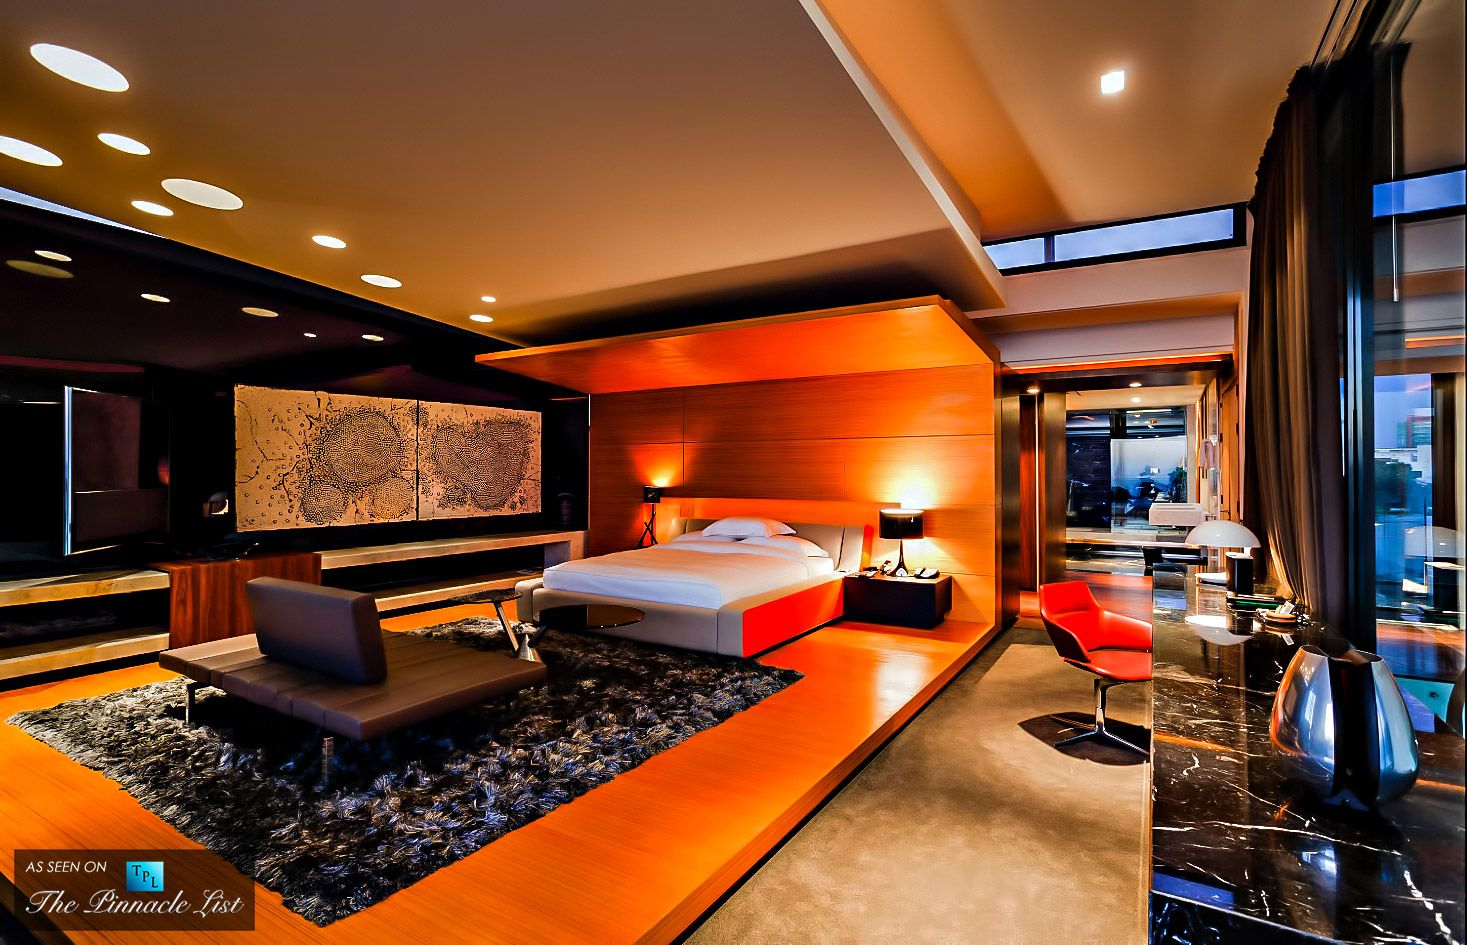 Dakar Sow Residence Dakar Senegal Bedrooms Lavish